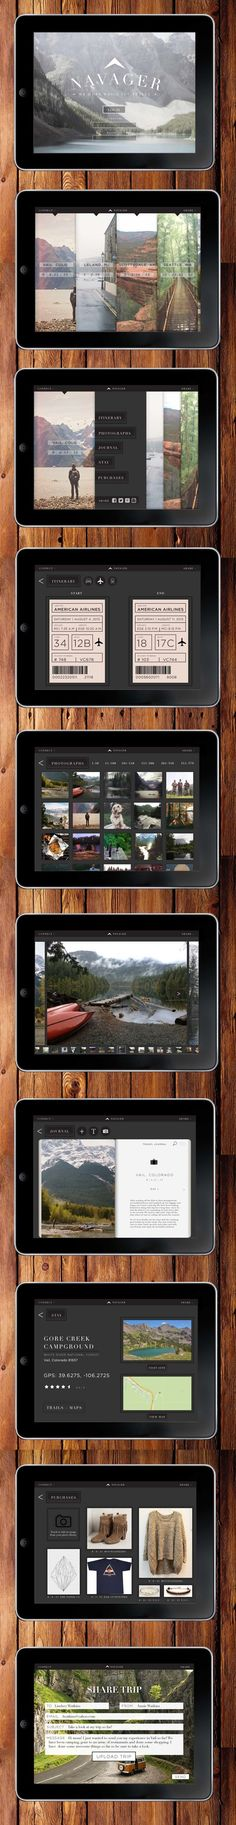 N A V A G E R travel app | Designer: Alex Milbourn - on App Design Served #ipadapp #journal